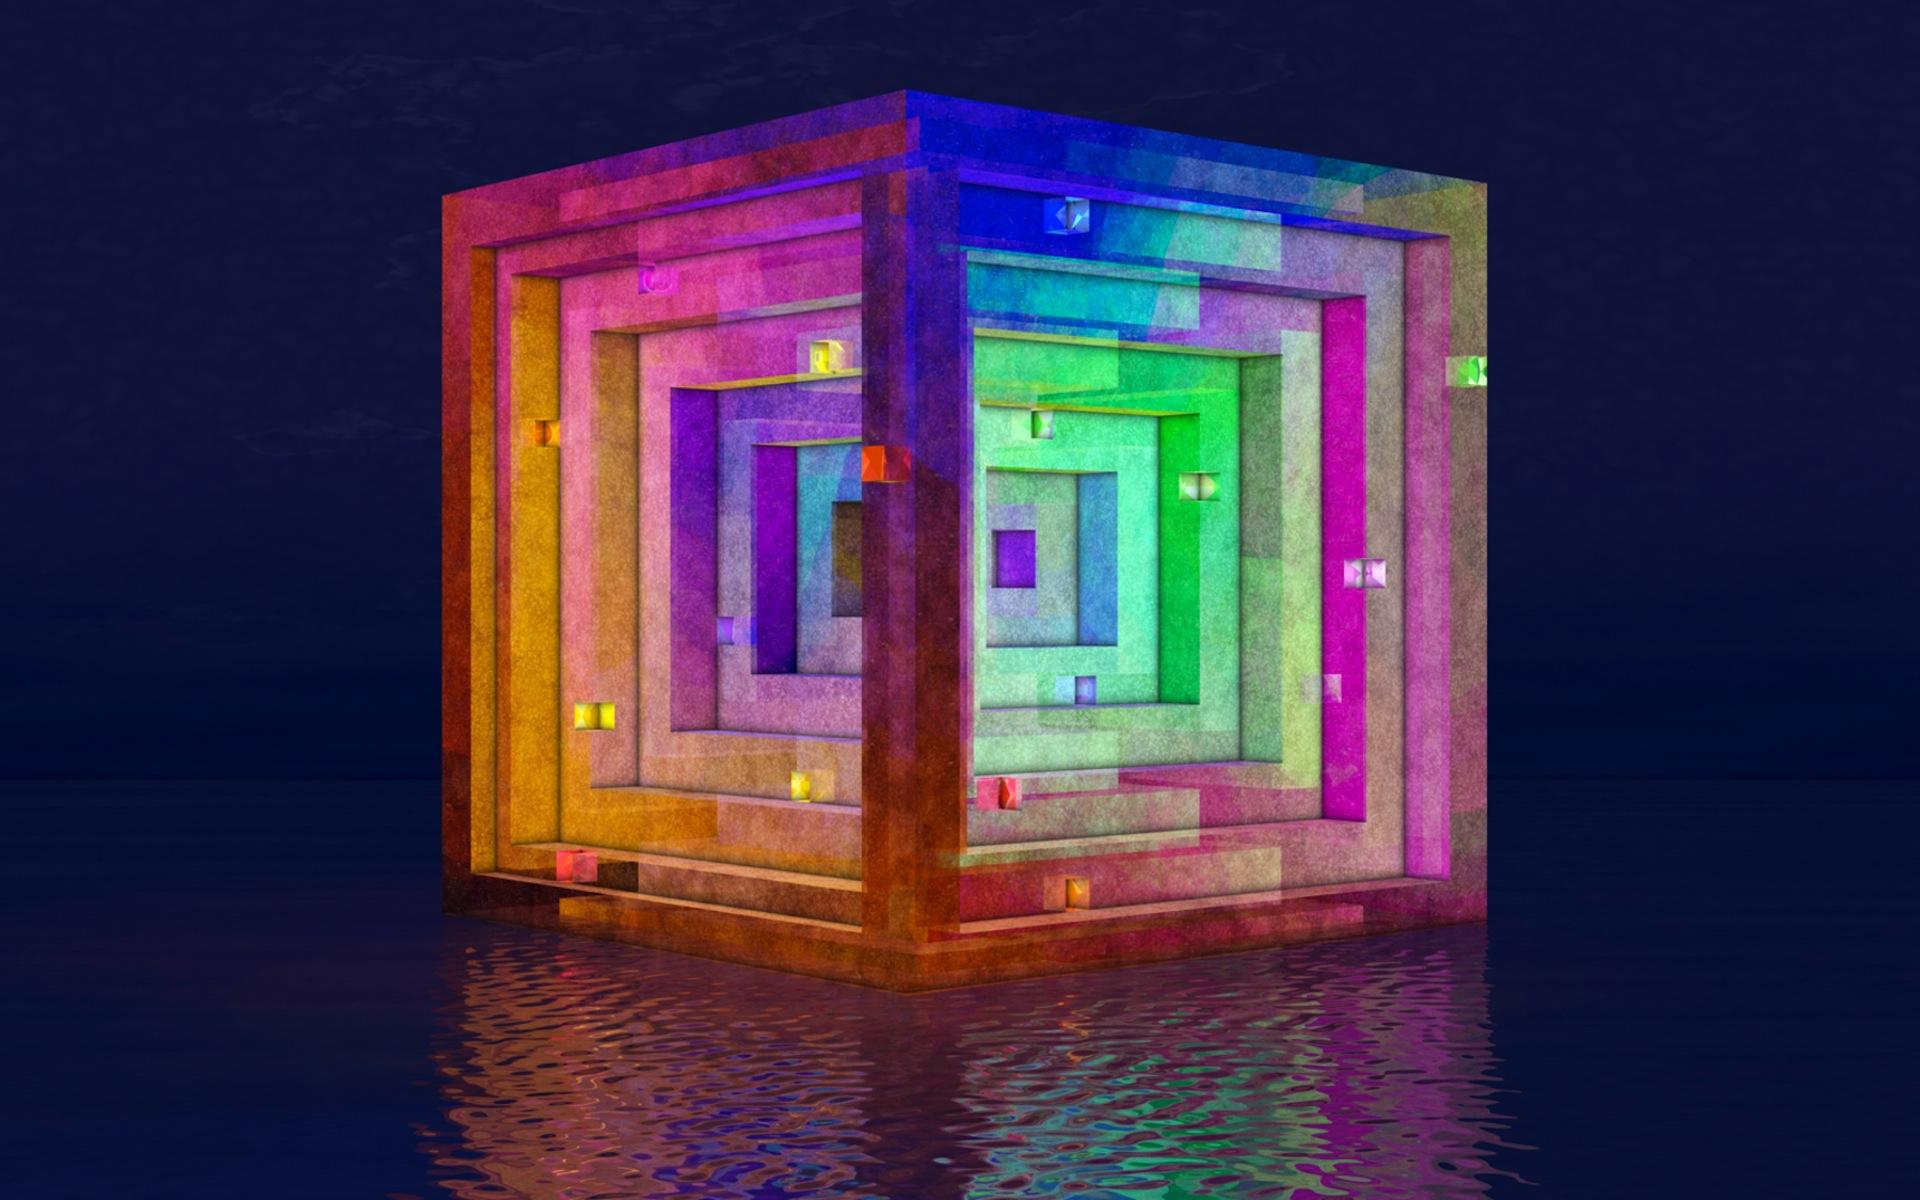 Cube 3d Wallpapers Cool Wallpaper18 1920x1200